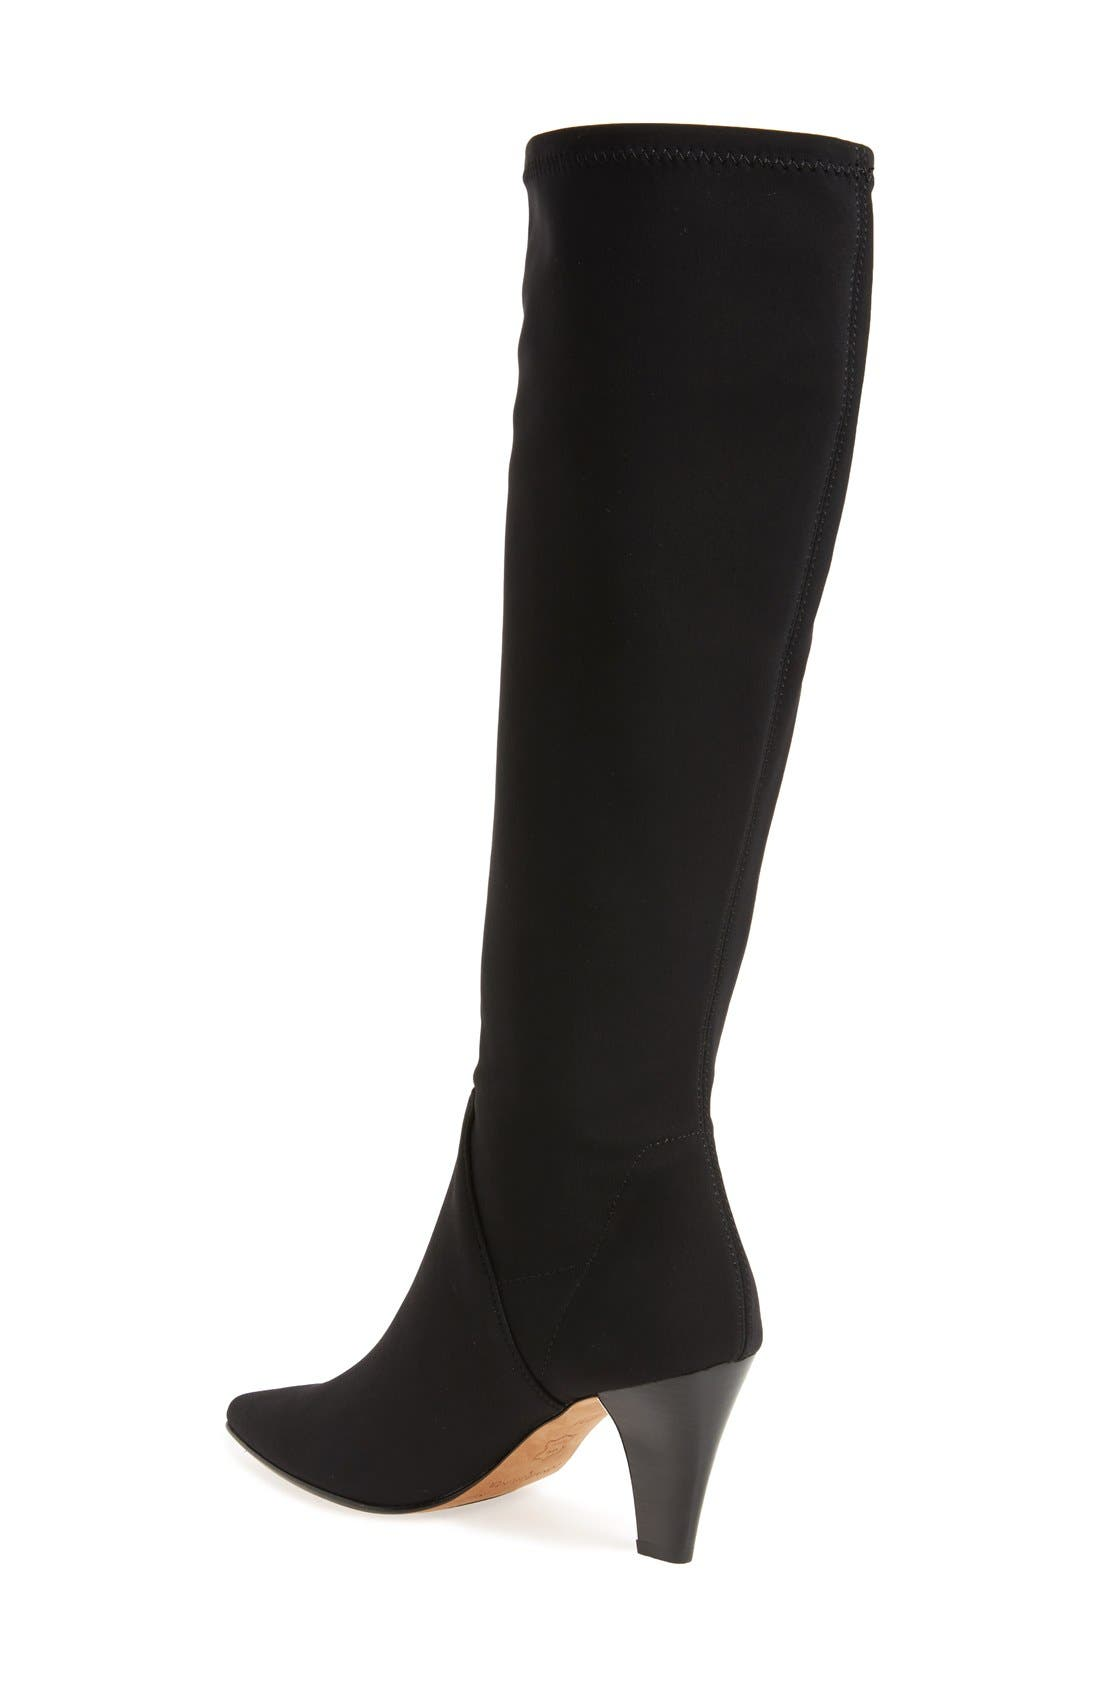 Alternate Image 2  - Donald J Pliner 'Tessa' Knee High Boot (Women)